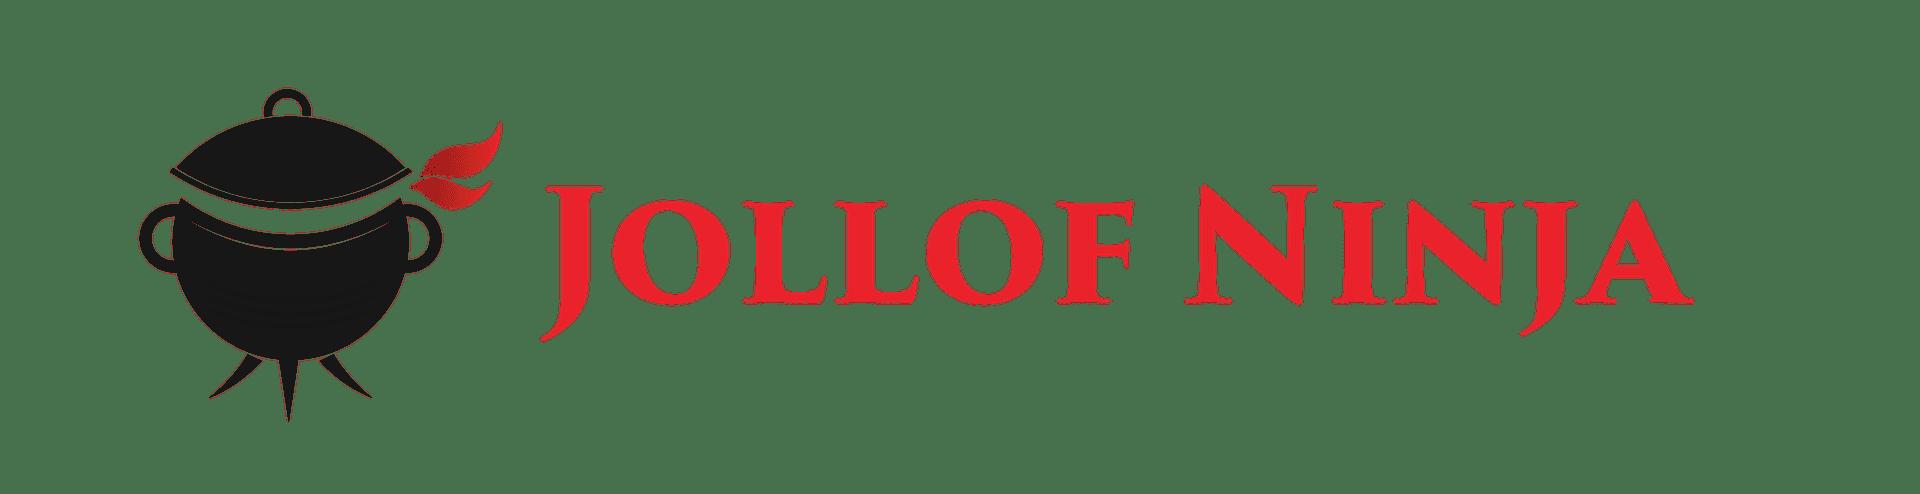 JollofNinja - Order West African cuisine online logo